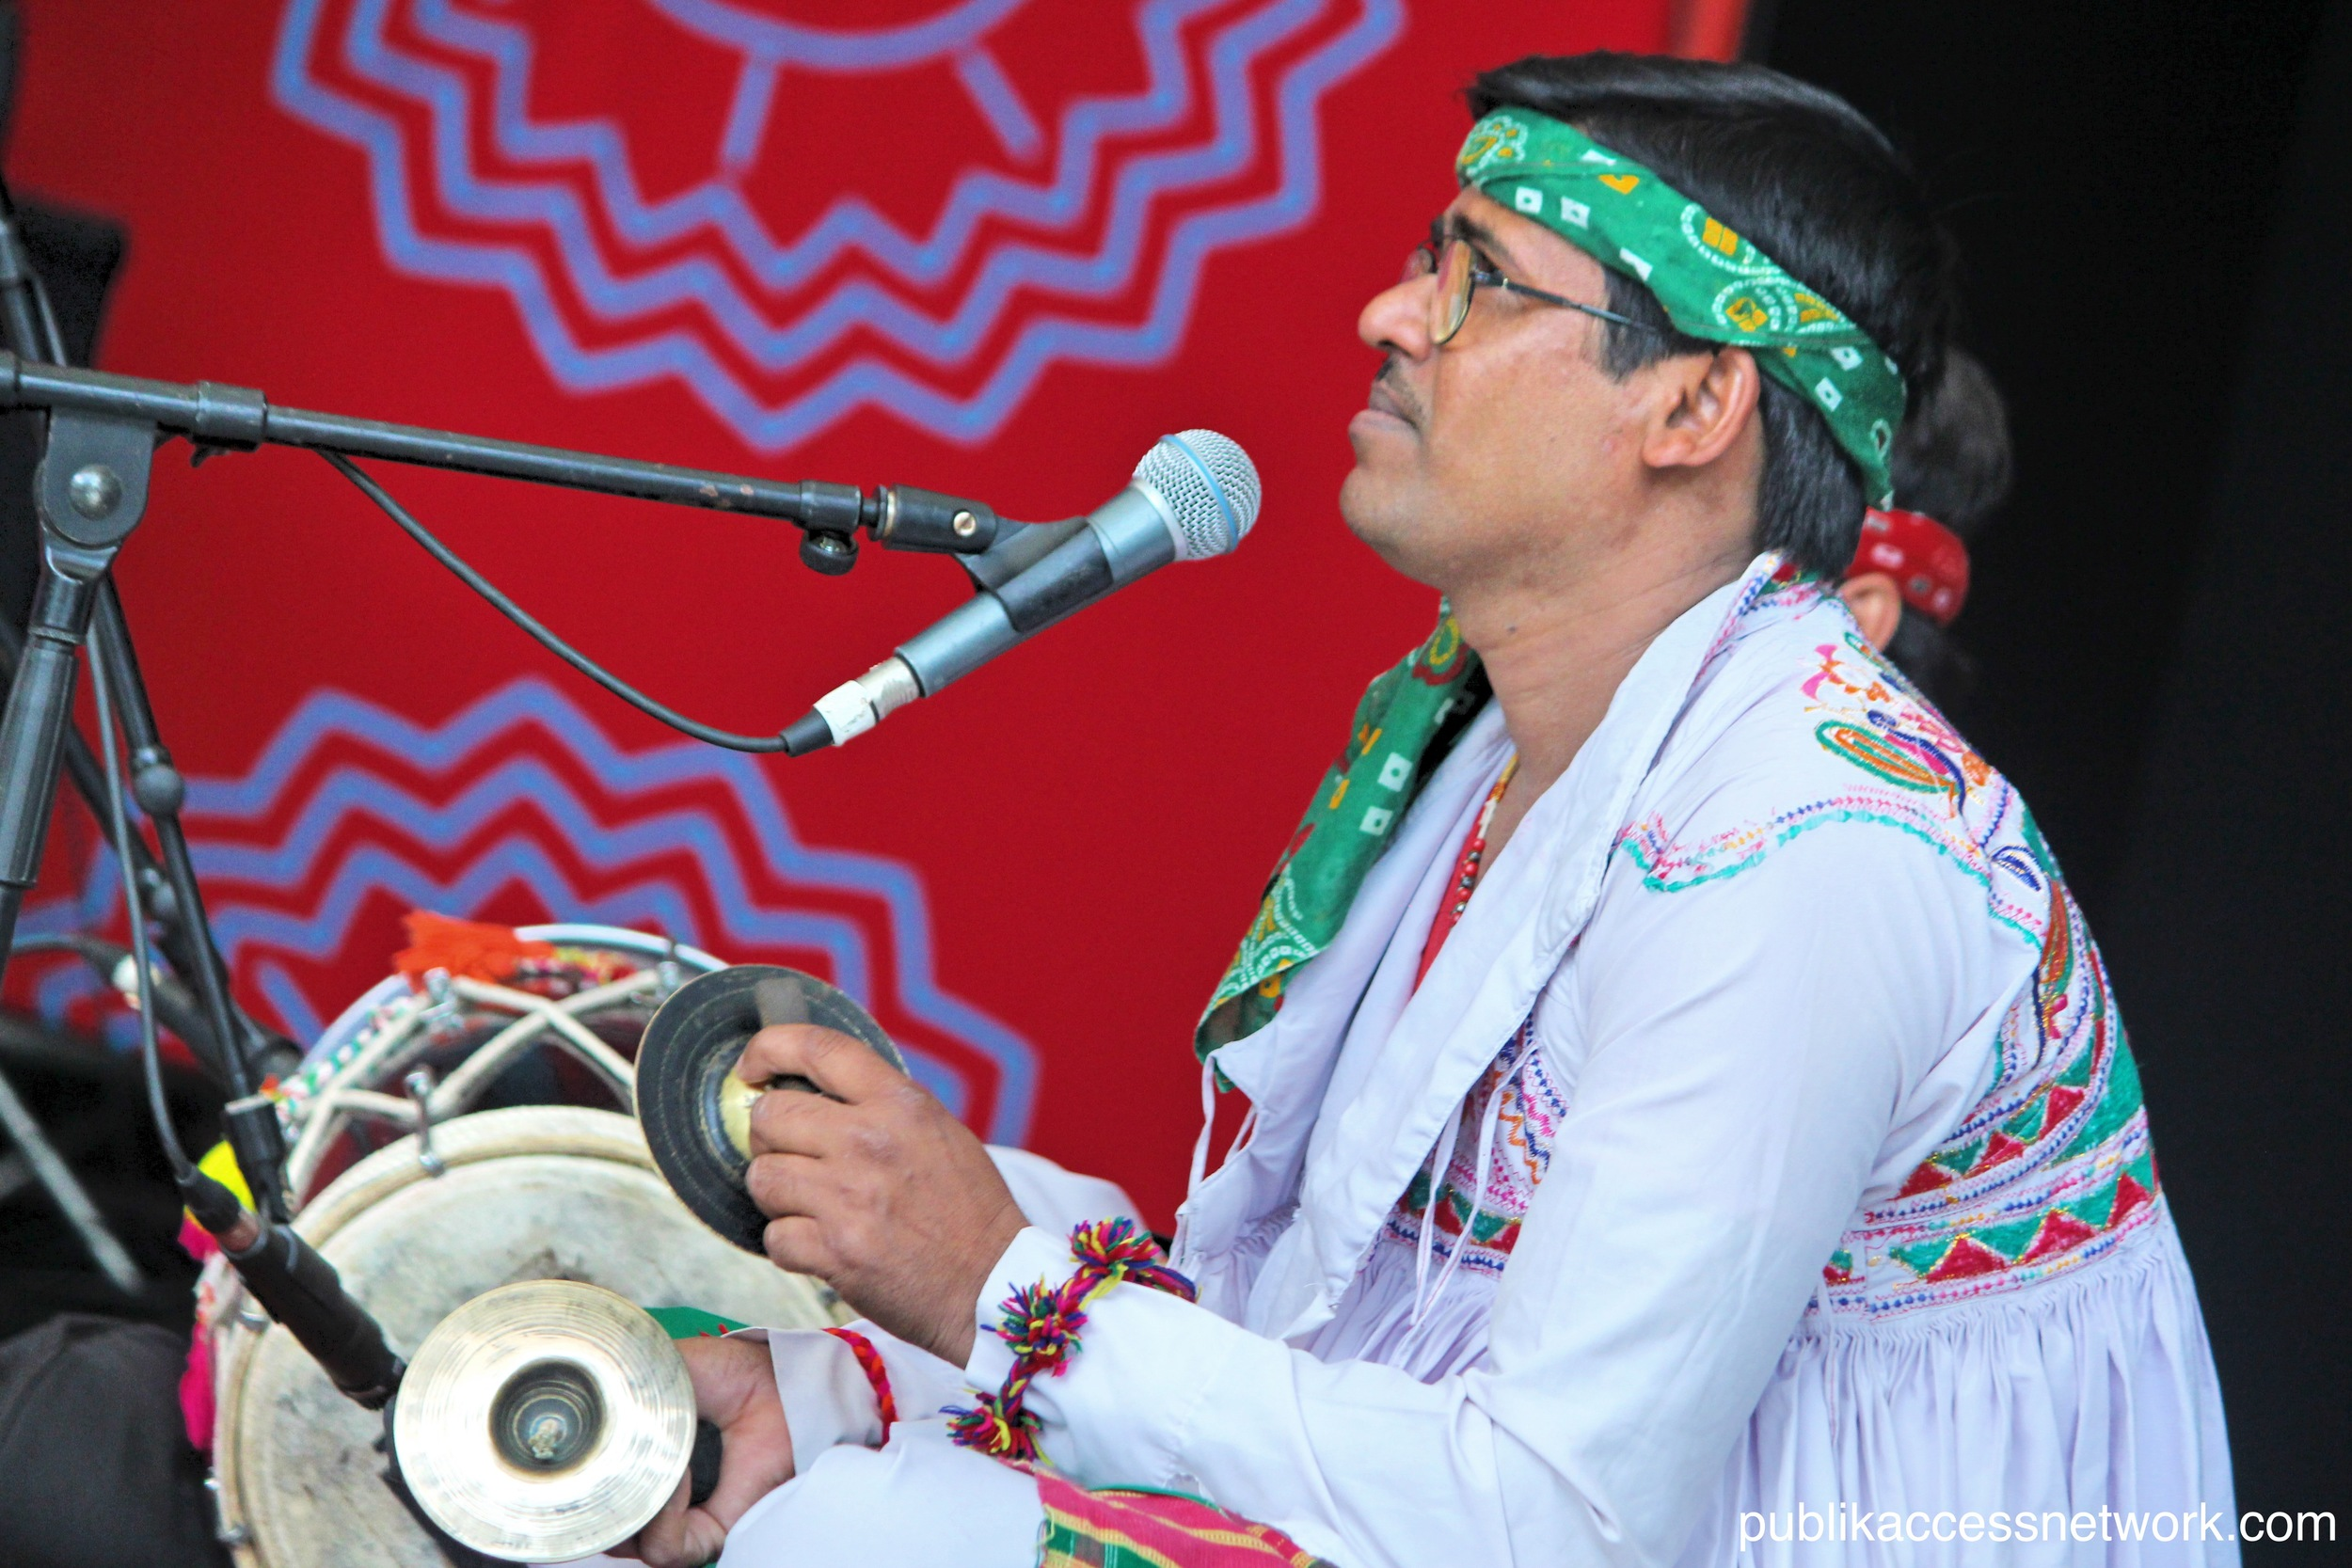 Ramin Khalatbari performing on the main stage